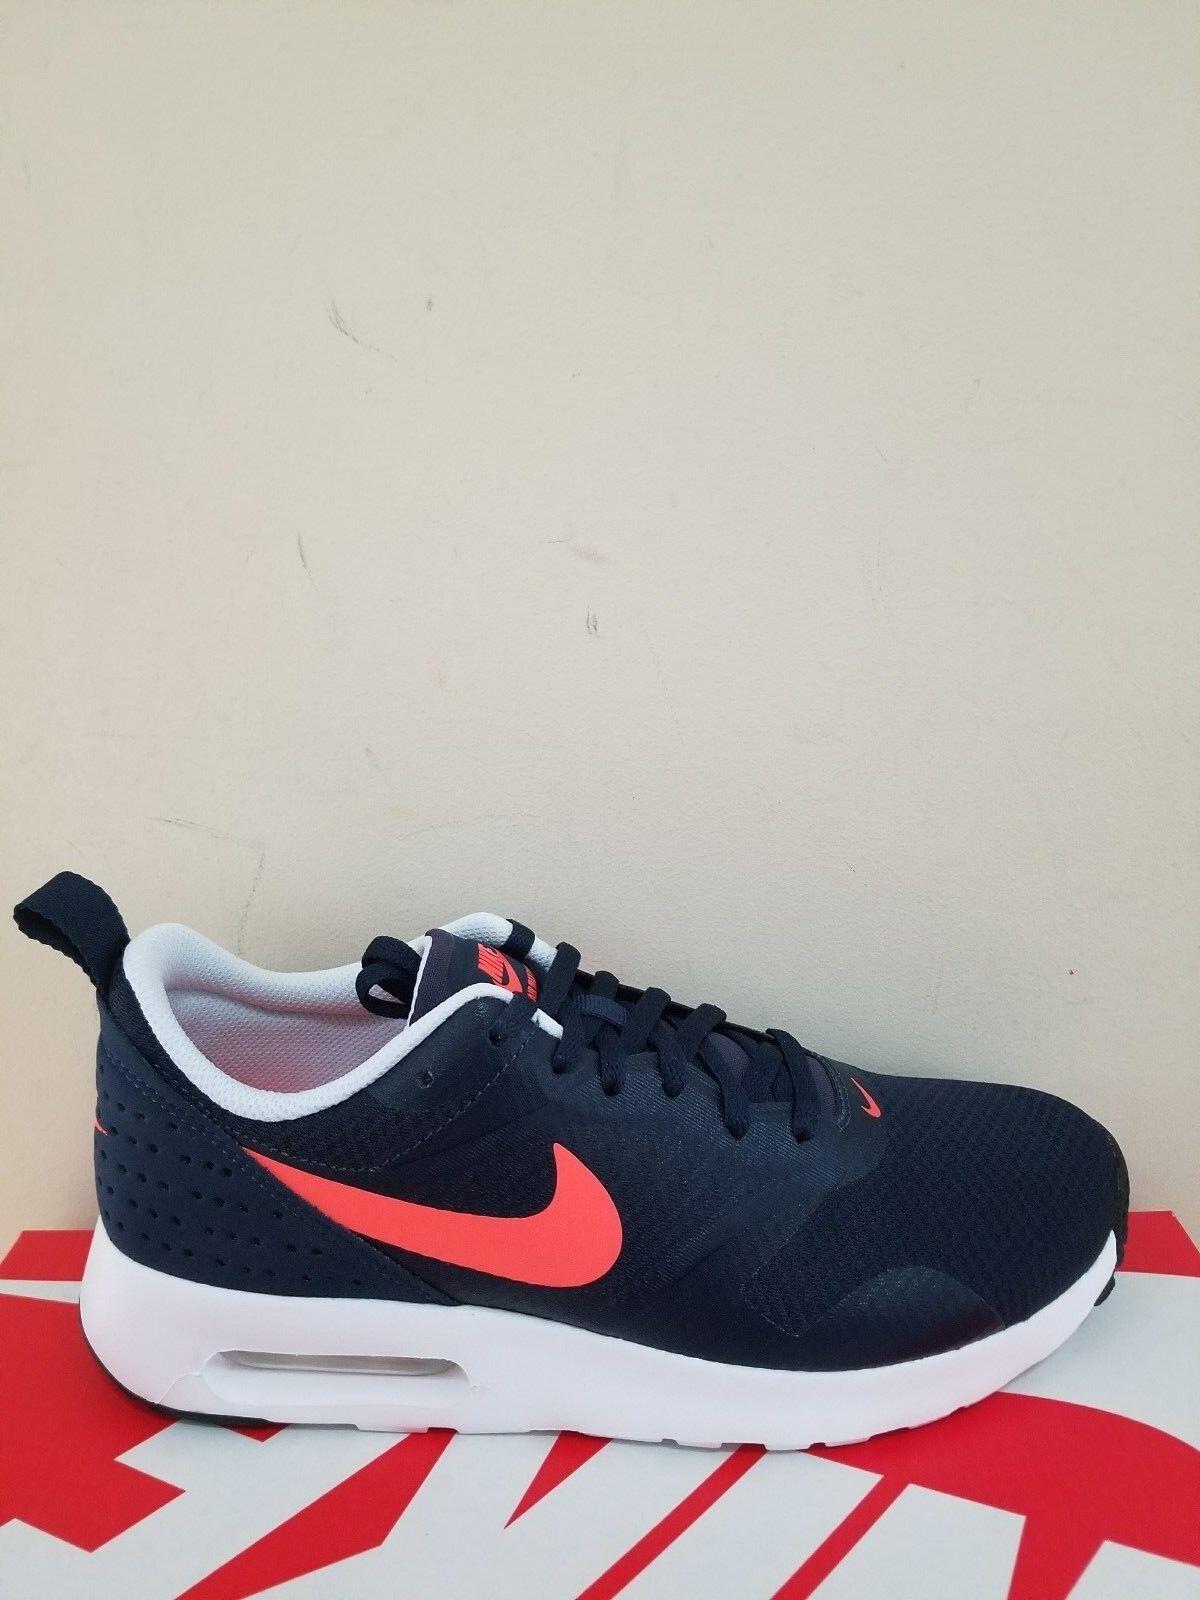 Nike Women's  Air Max Tavas Running Shoes Size 8 NIB